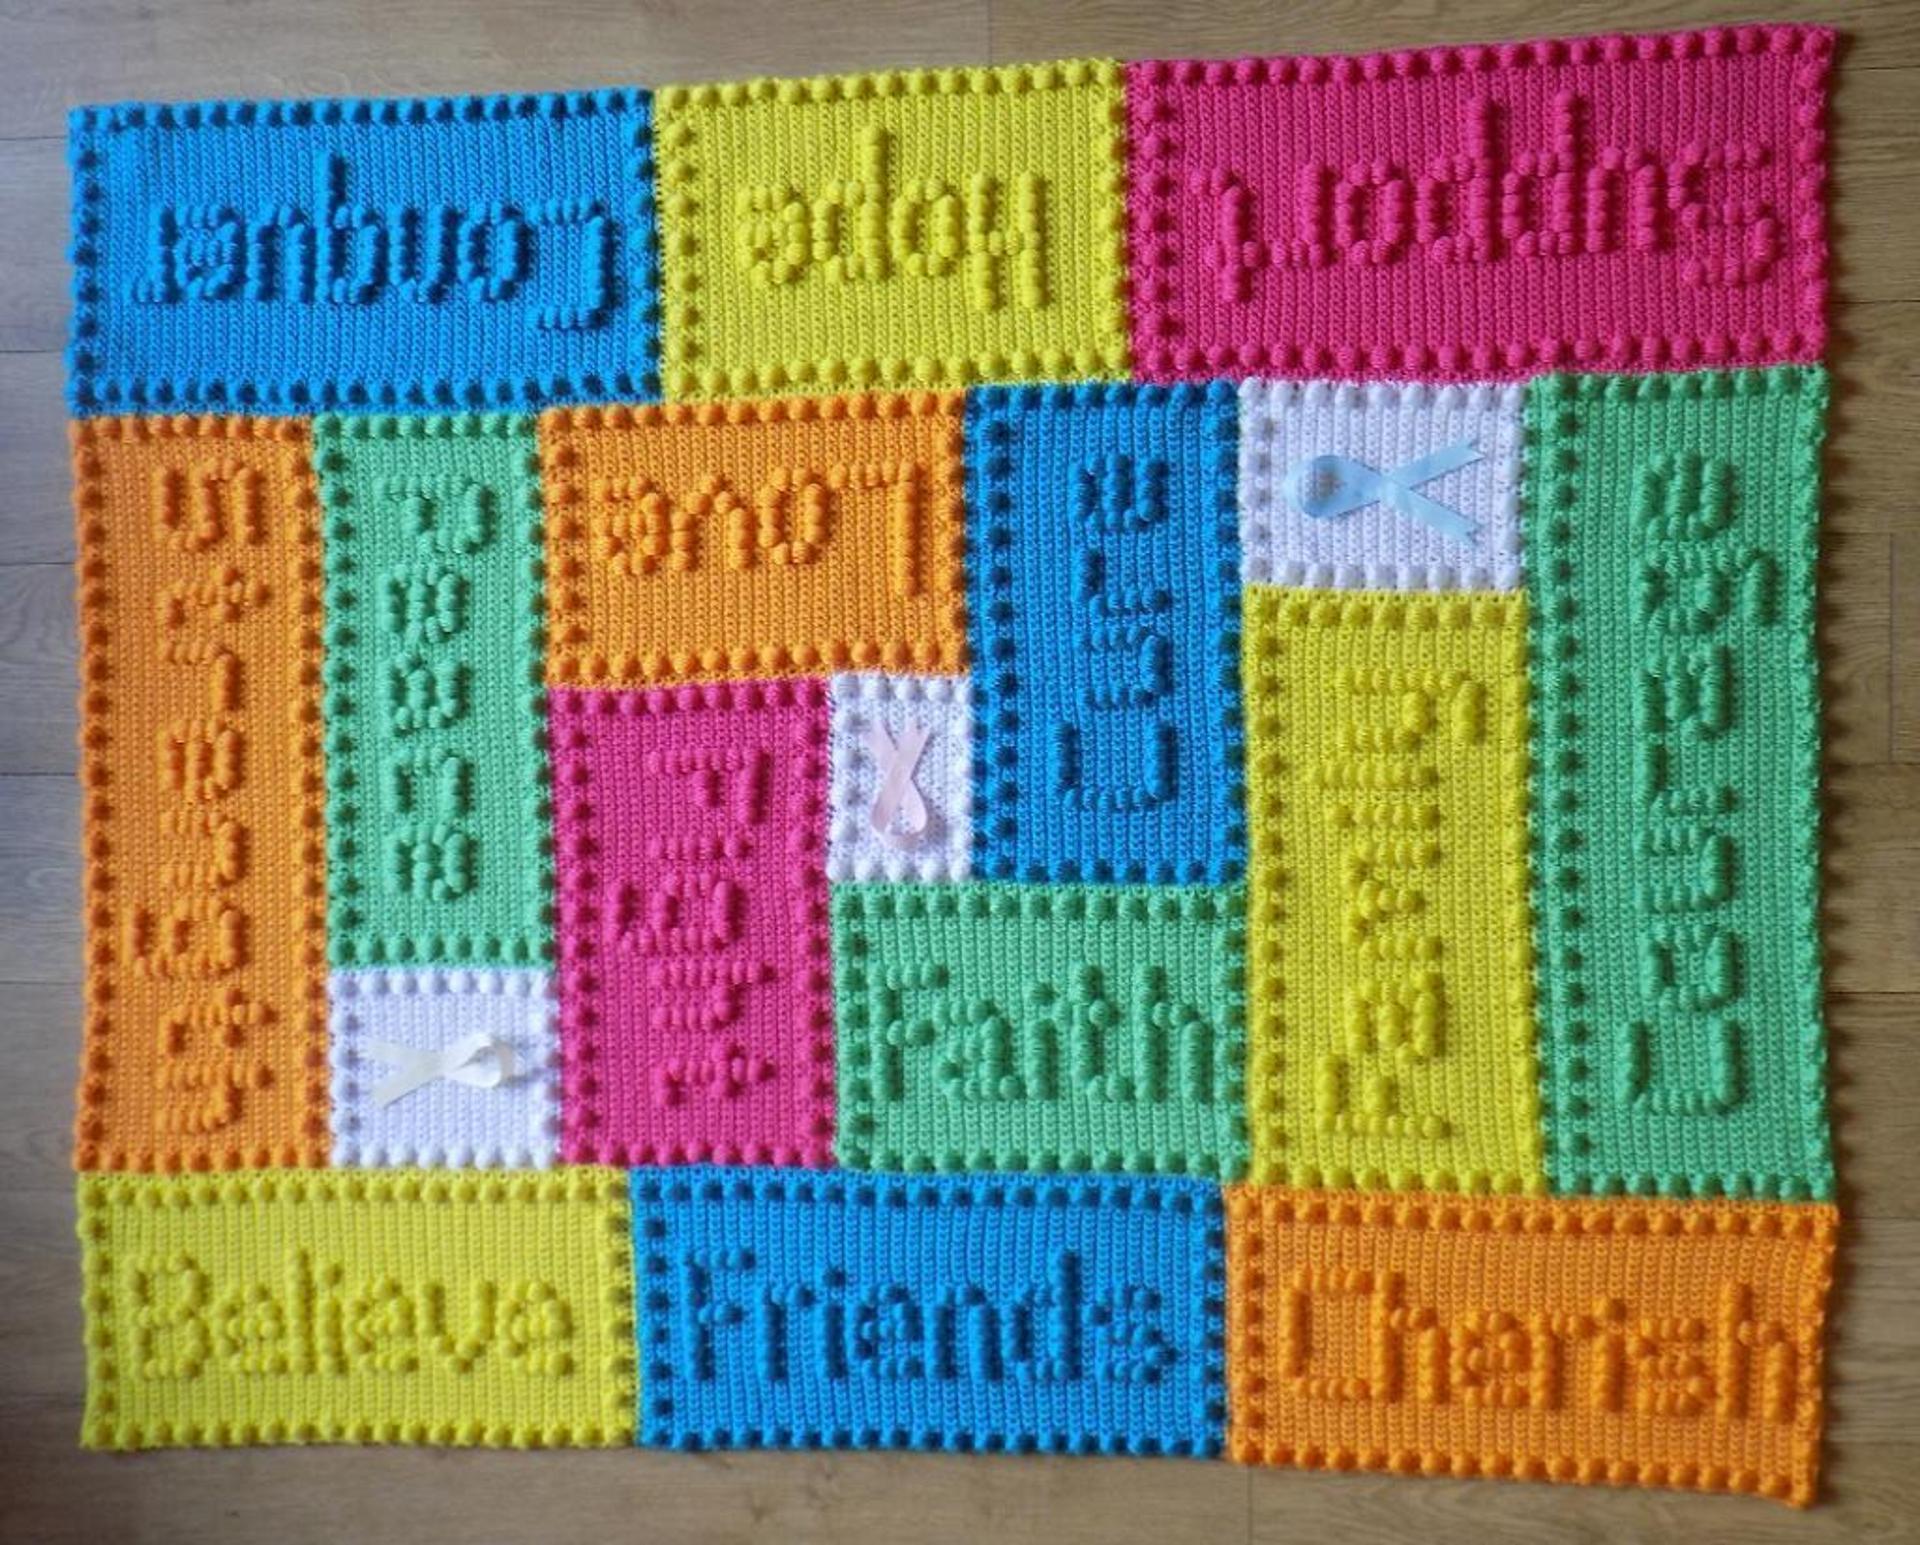 cancer support motifs lap blanket crochet pattern